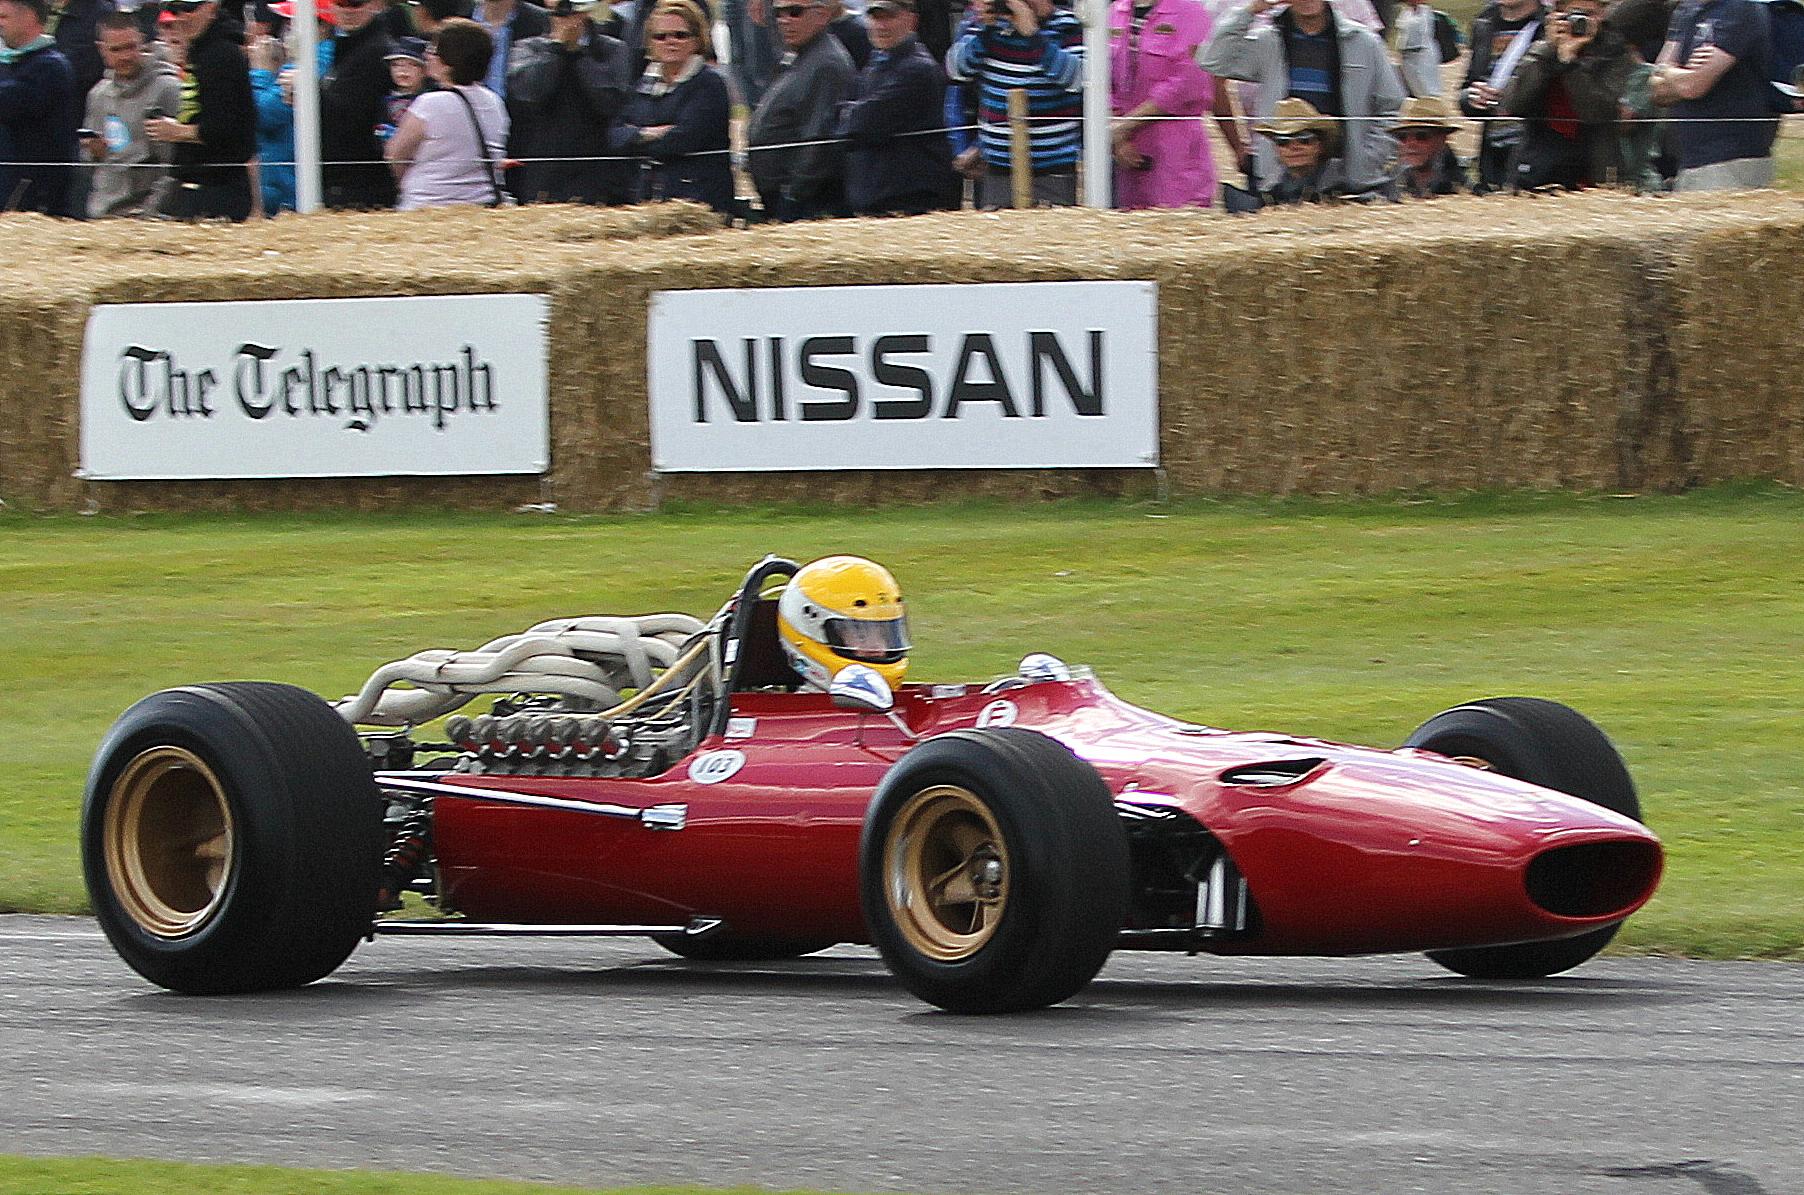 Ferrari 312/68 (1968 - ex. Jacky Ickx)